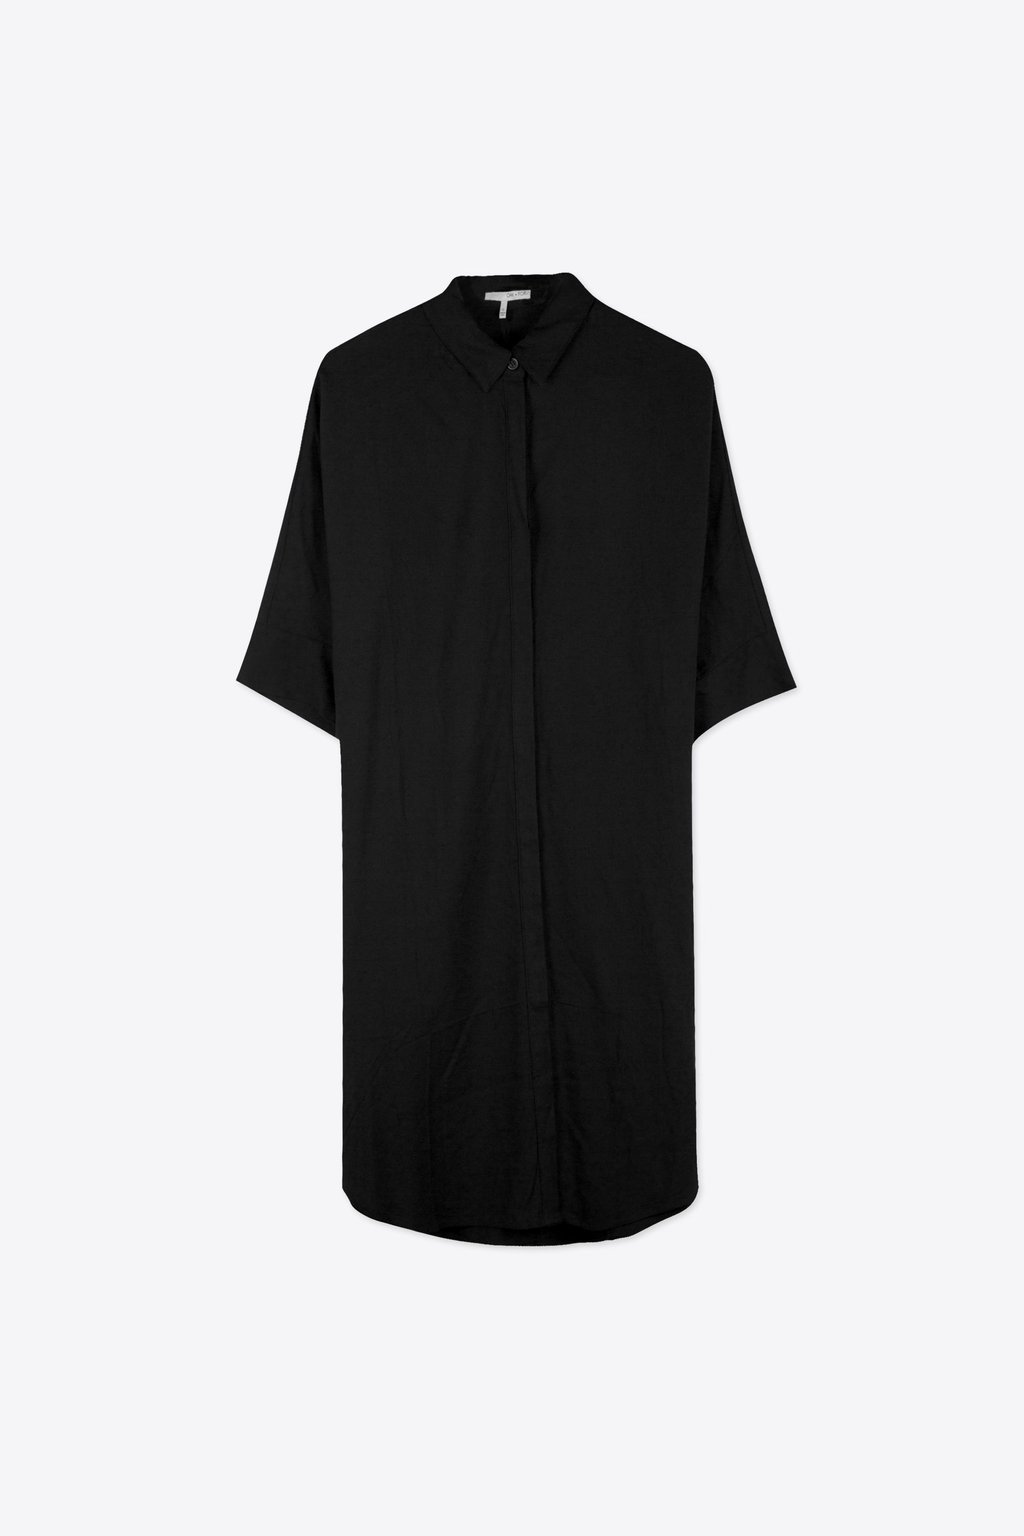 Dress 1083 Black 9